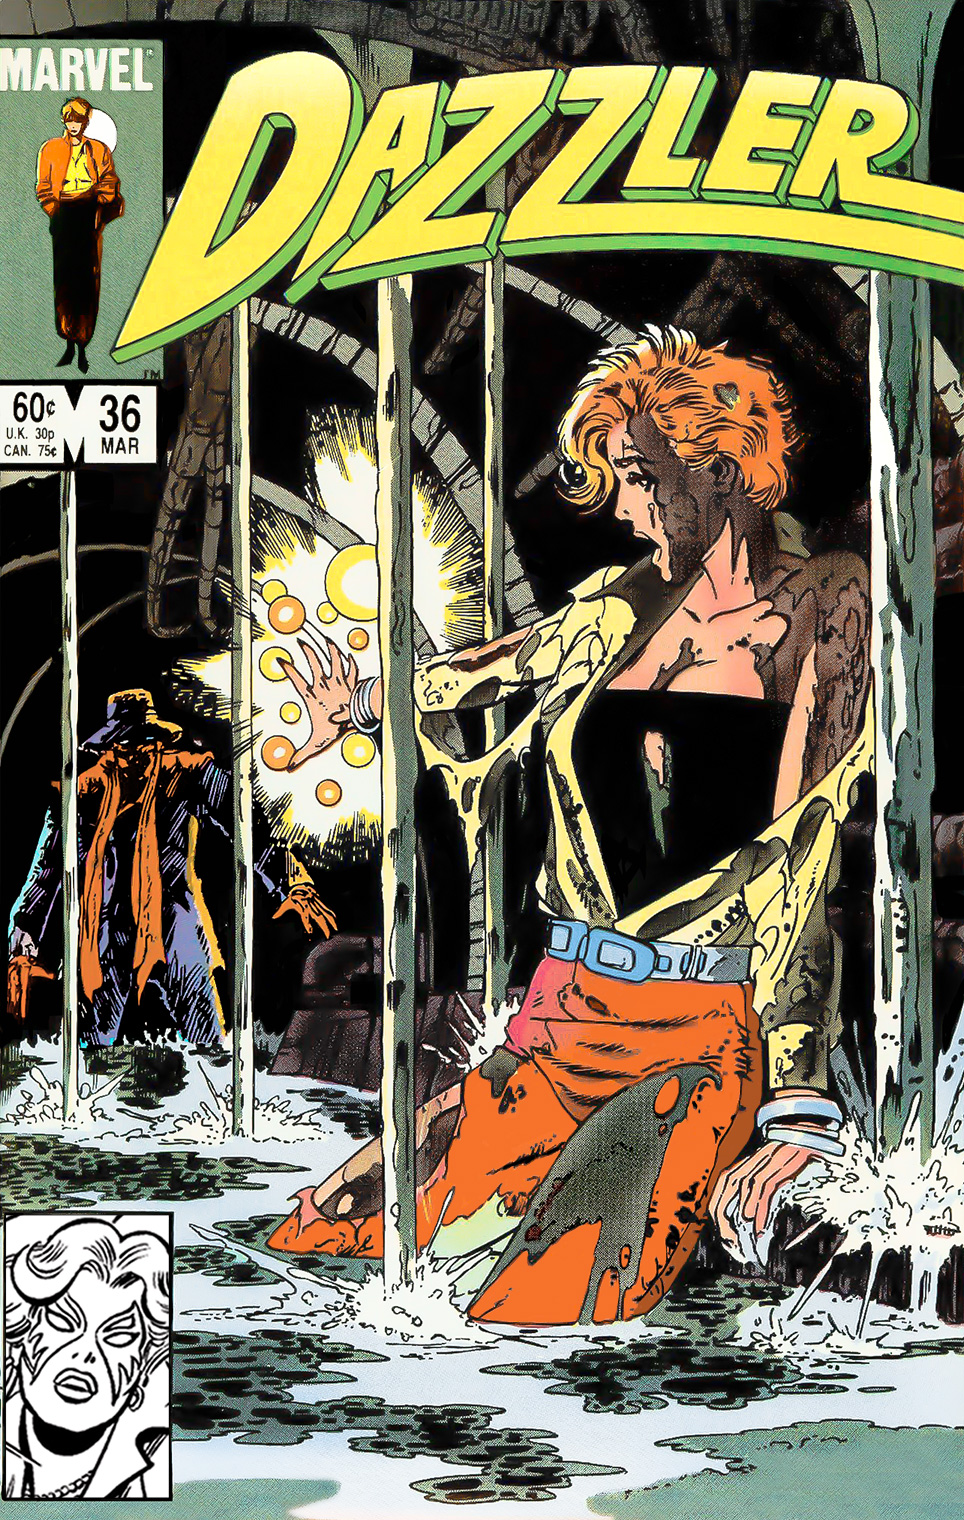 Dazzler (1981) #36